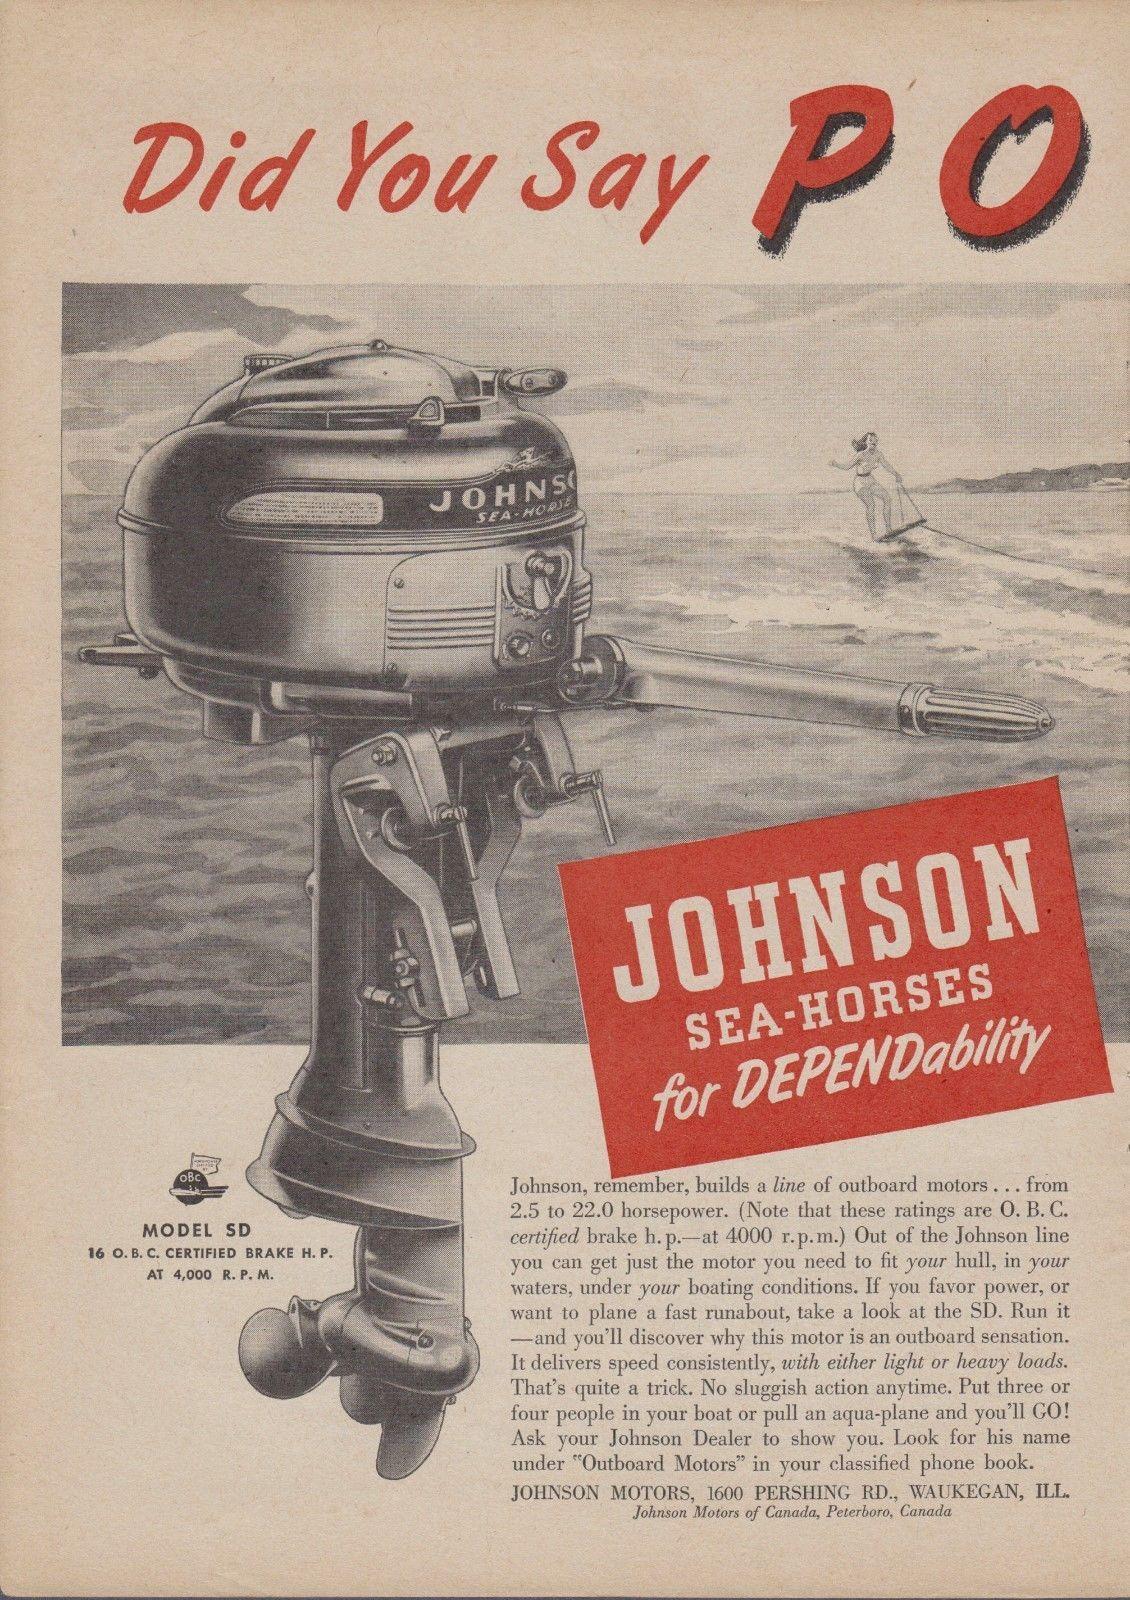 Johnson Sea-horse Outboard Motors Vintage Reproduction Metal Sign 8 x 12